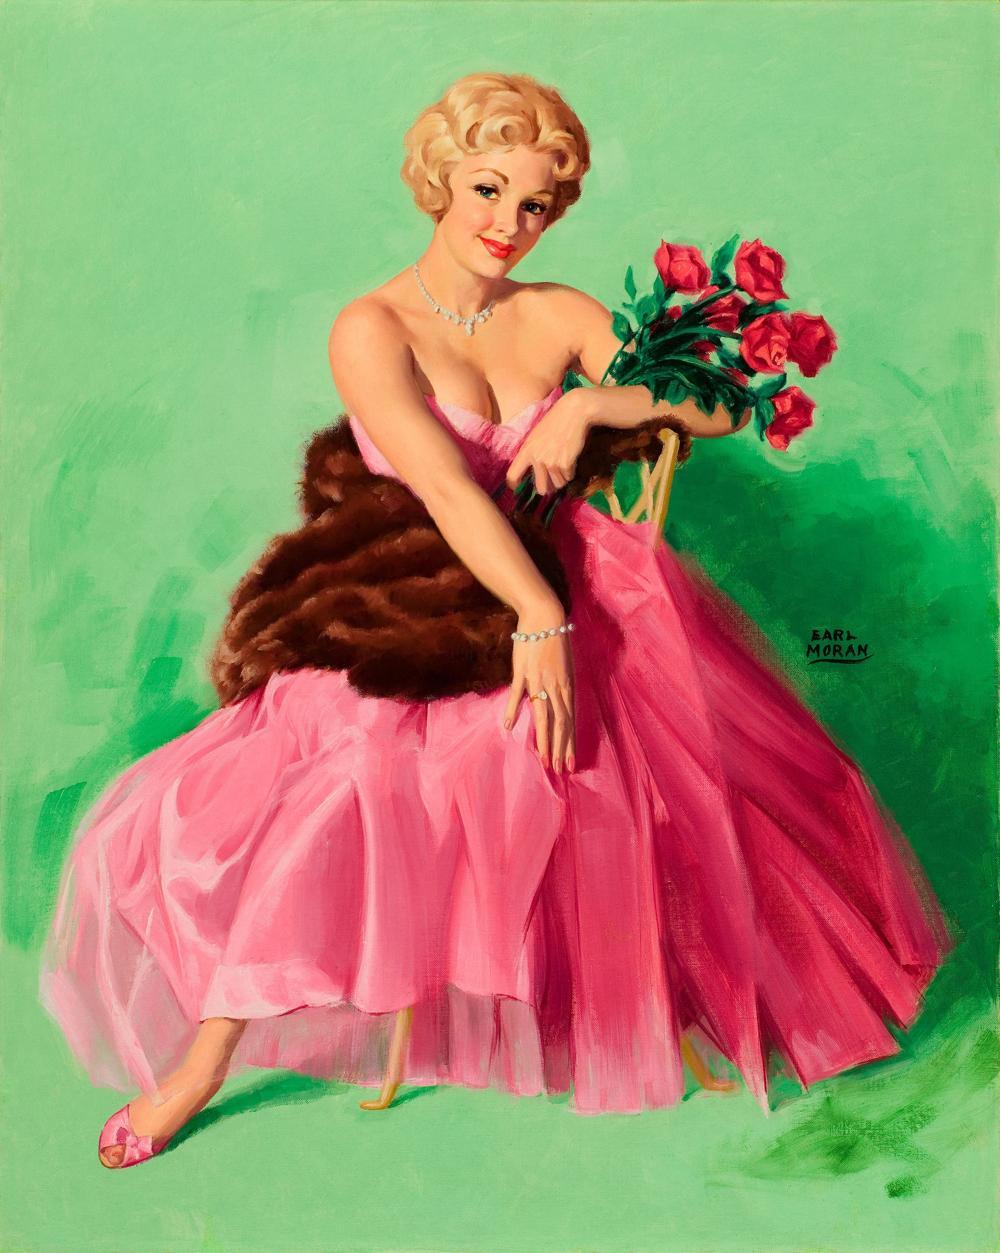 Earl Moran Lady in Pink